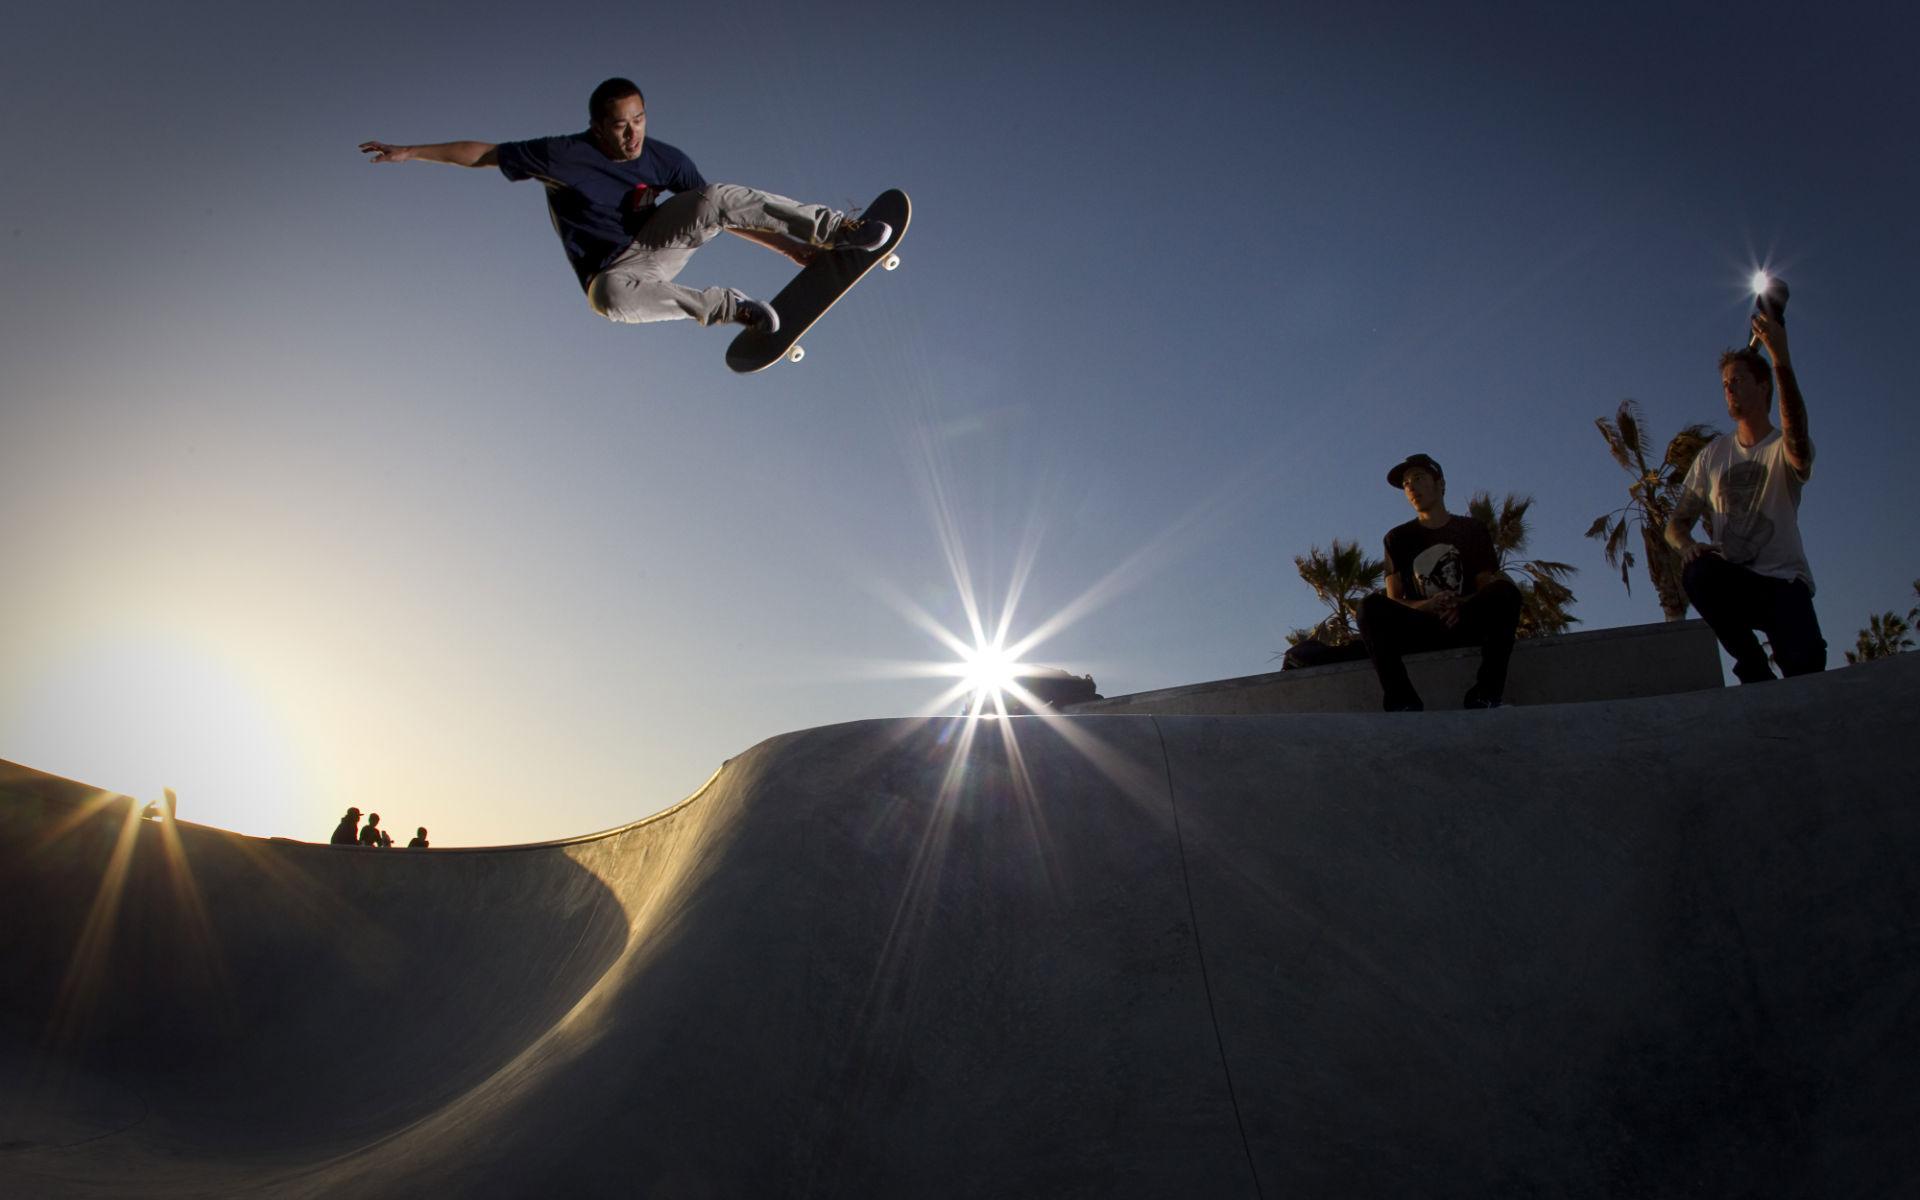 Skateboard Images Hd imagebasketnet 1920x1200